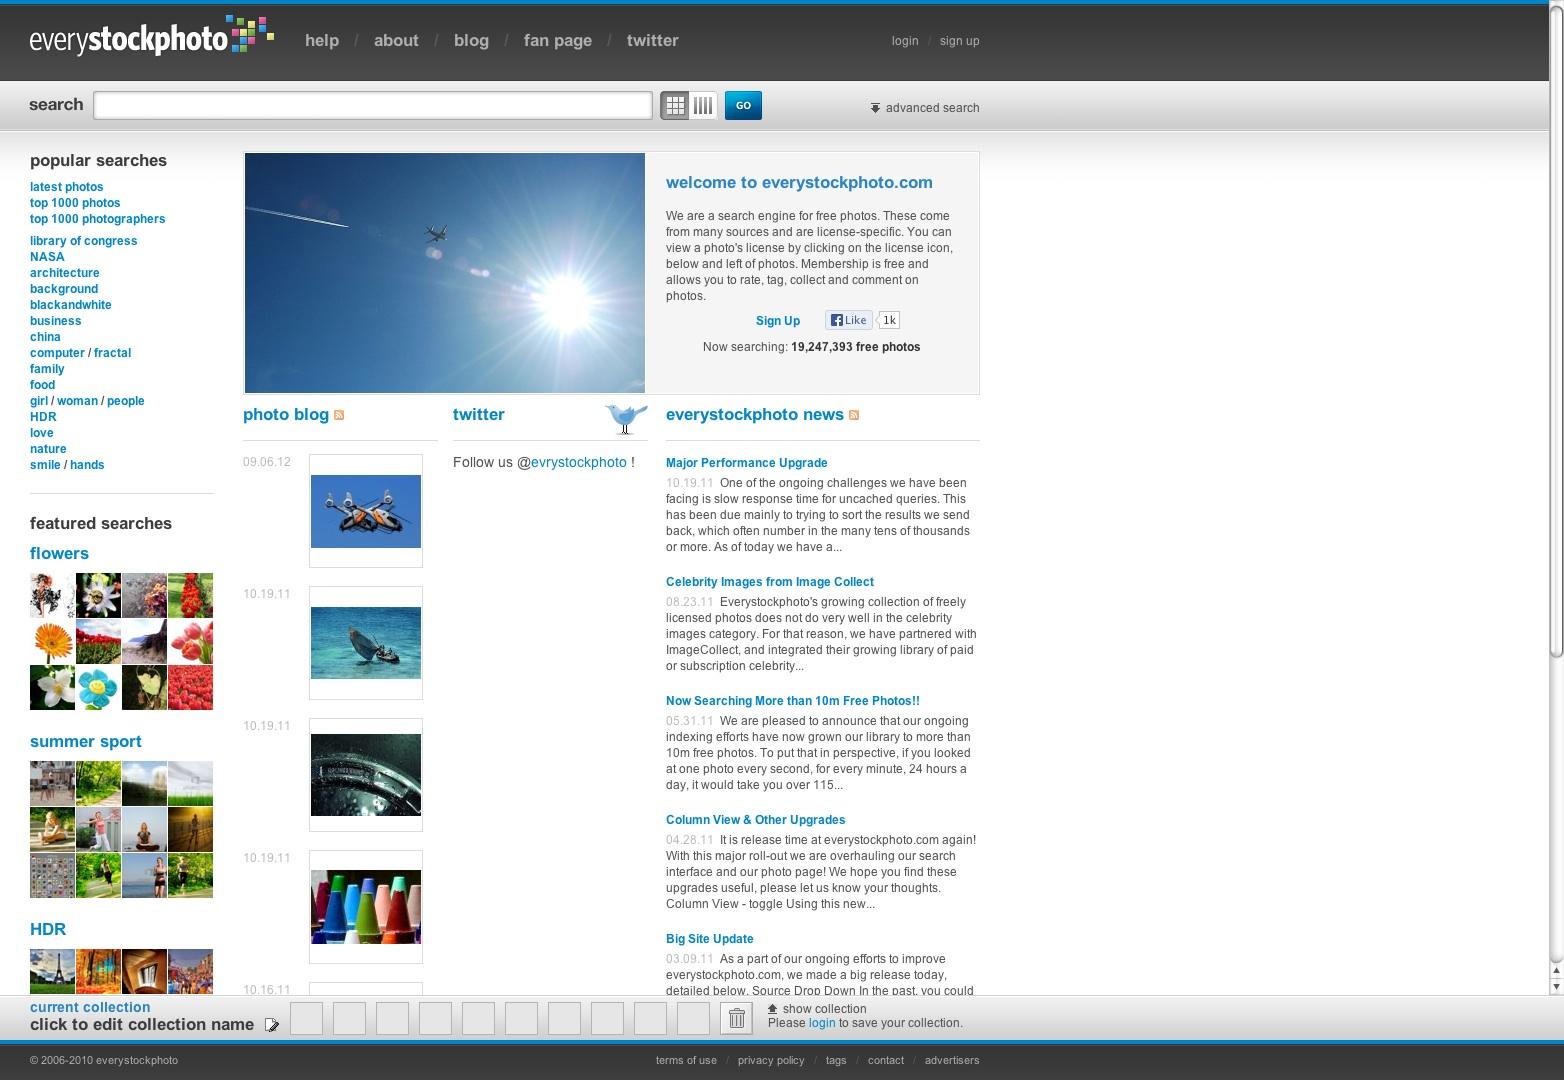 everystockphoto-searching-free-photos.jpg